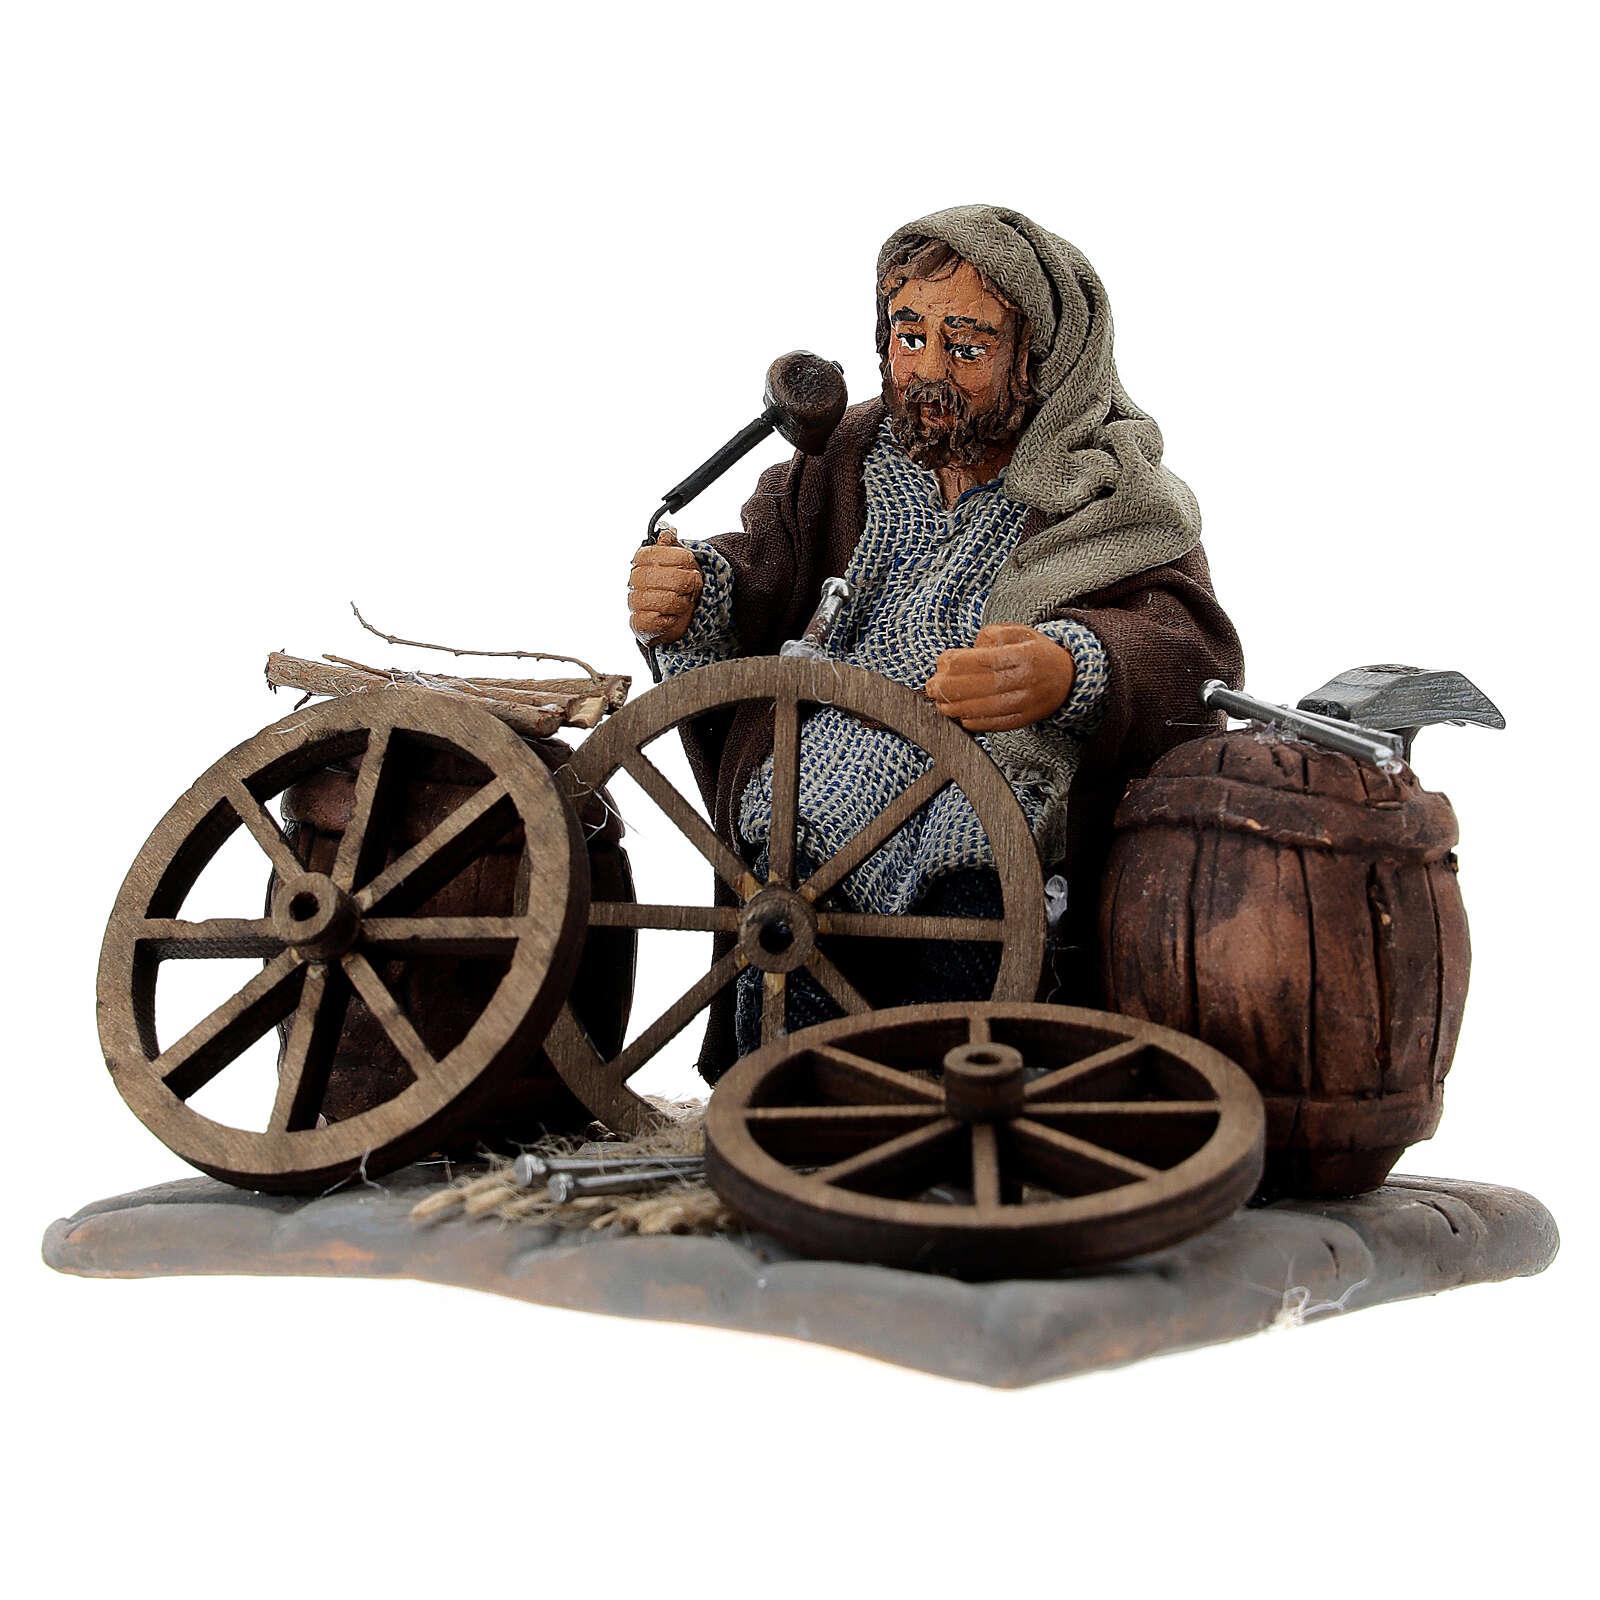 Reparador de ruedas 10 cm Belén napolitano 4